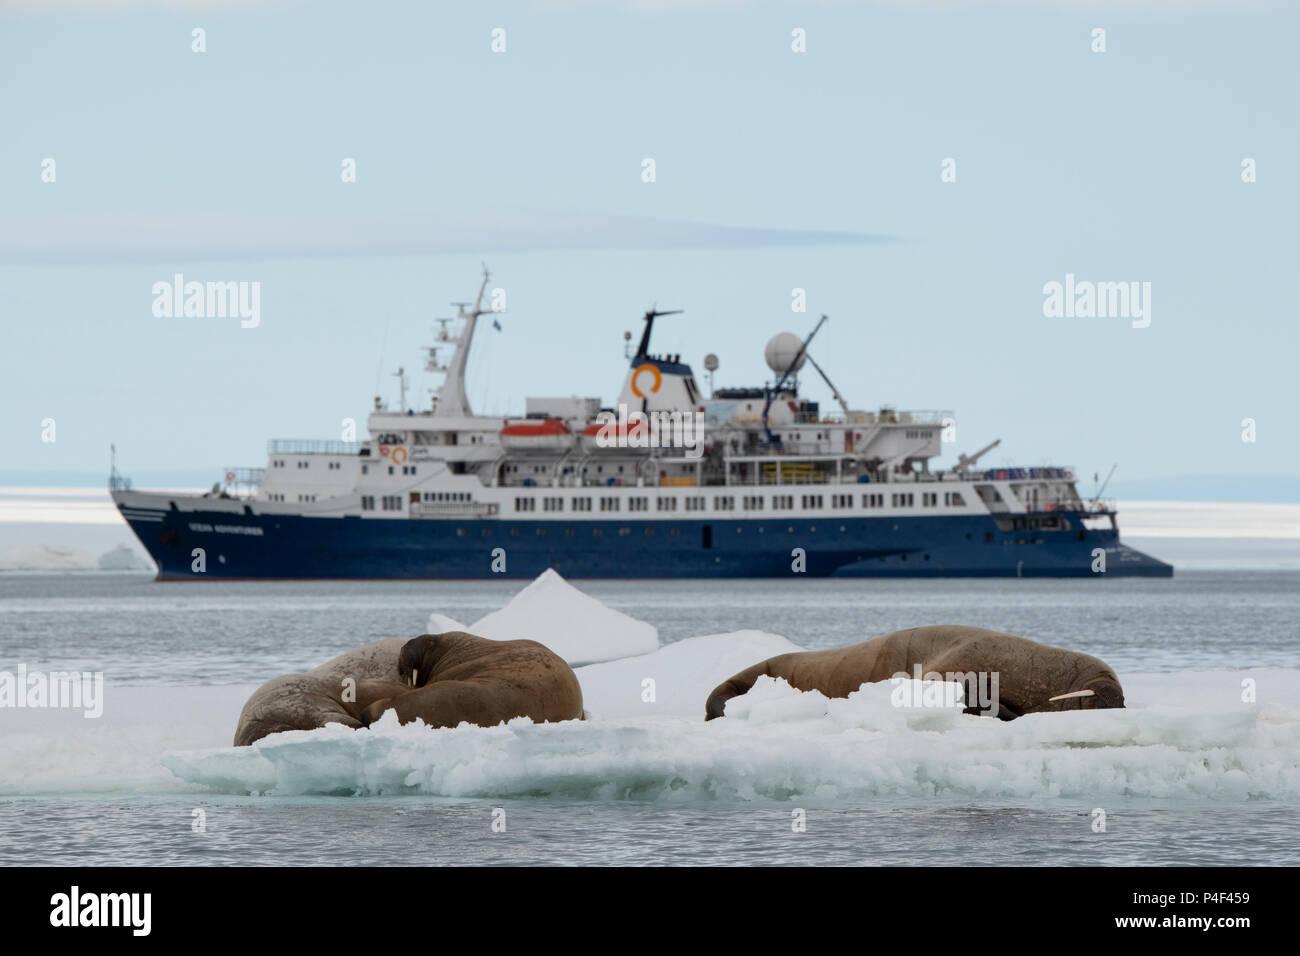 Norway, Svalbard, Nordaustlandet, Austfonna. Walrus (Odobenus rosmarus) with Quark's expedition ship, Ocean Adventurer, in the distance. - Stock Image